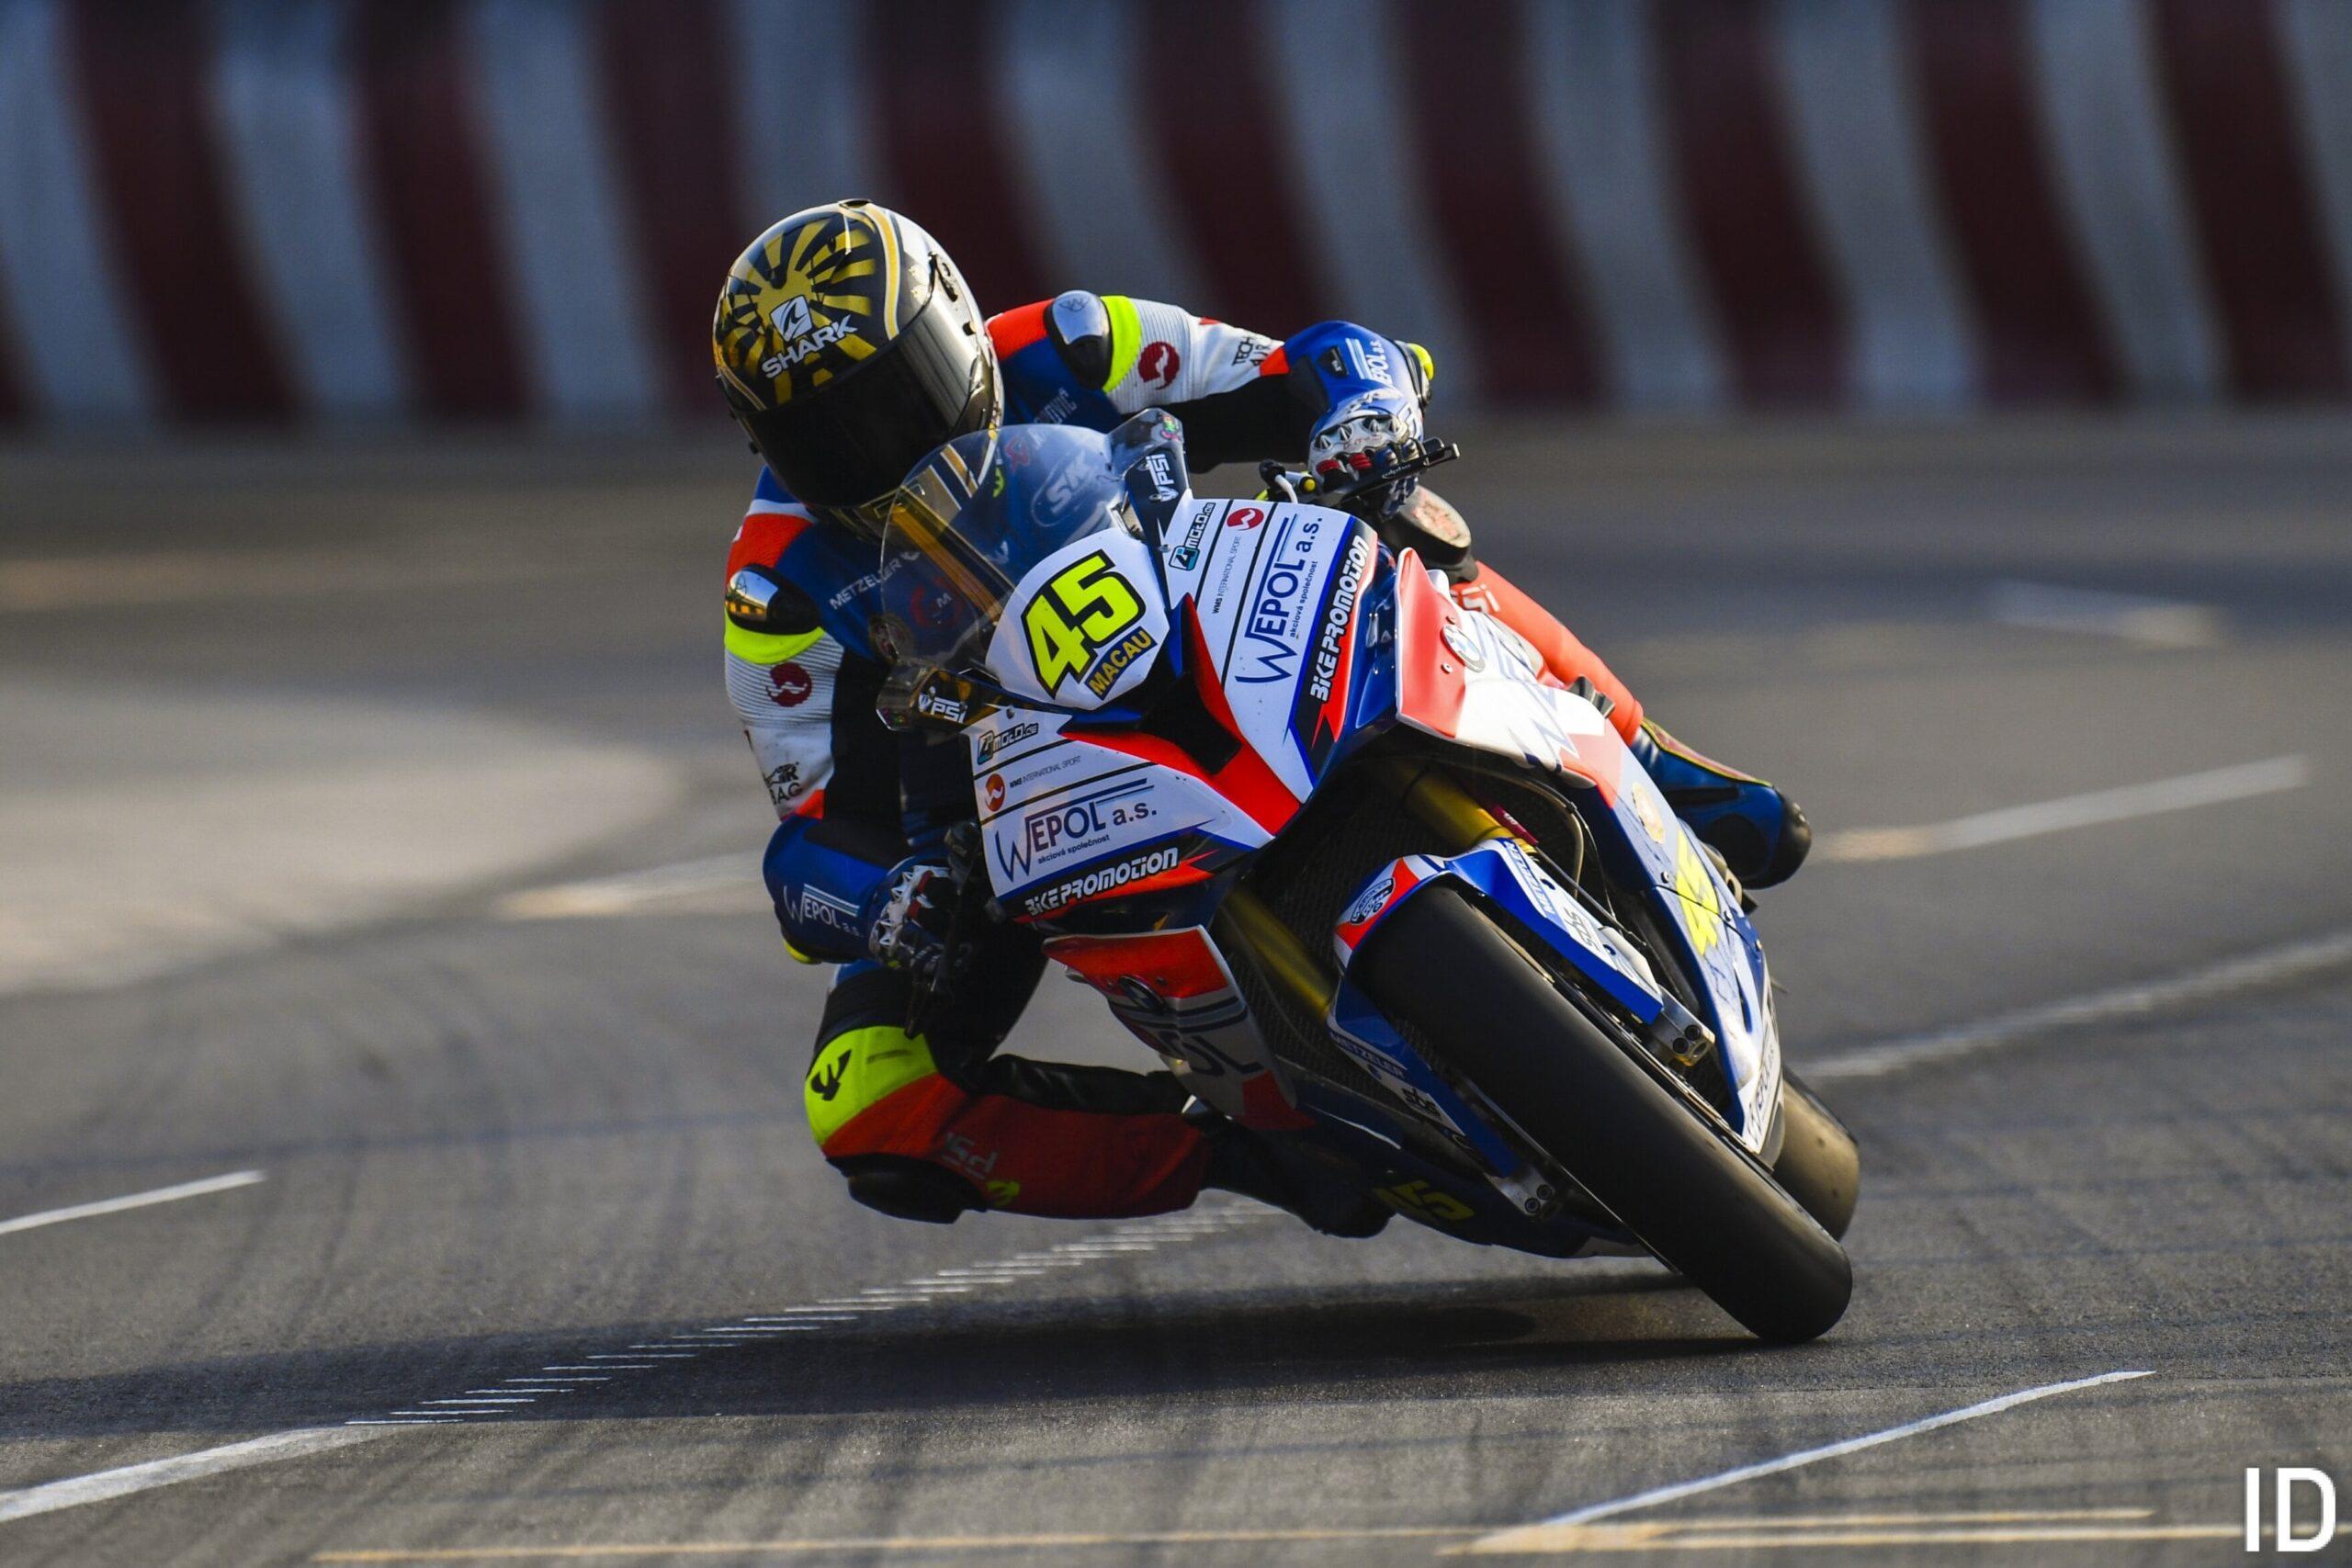 Wepol Racing Confirm 2020 IRRC Superbike Venture With Czech Star Cerveny